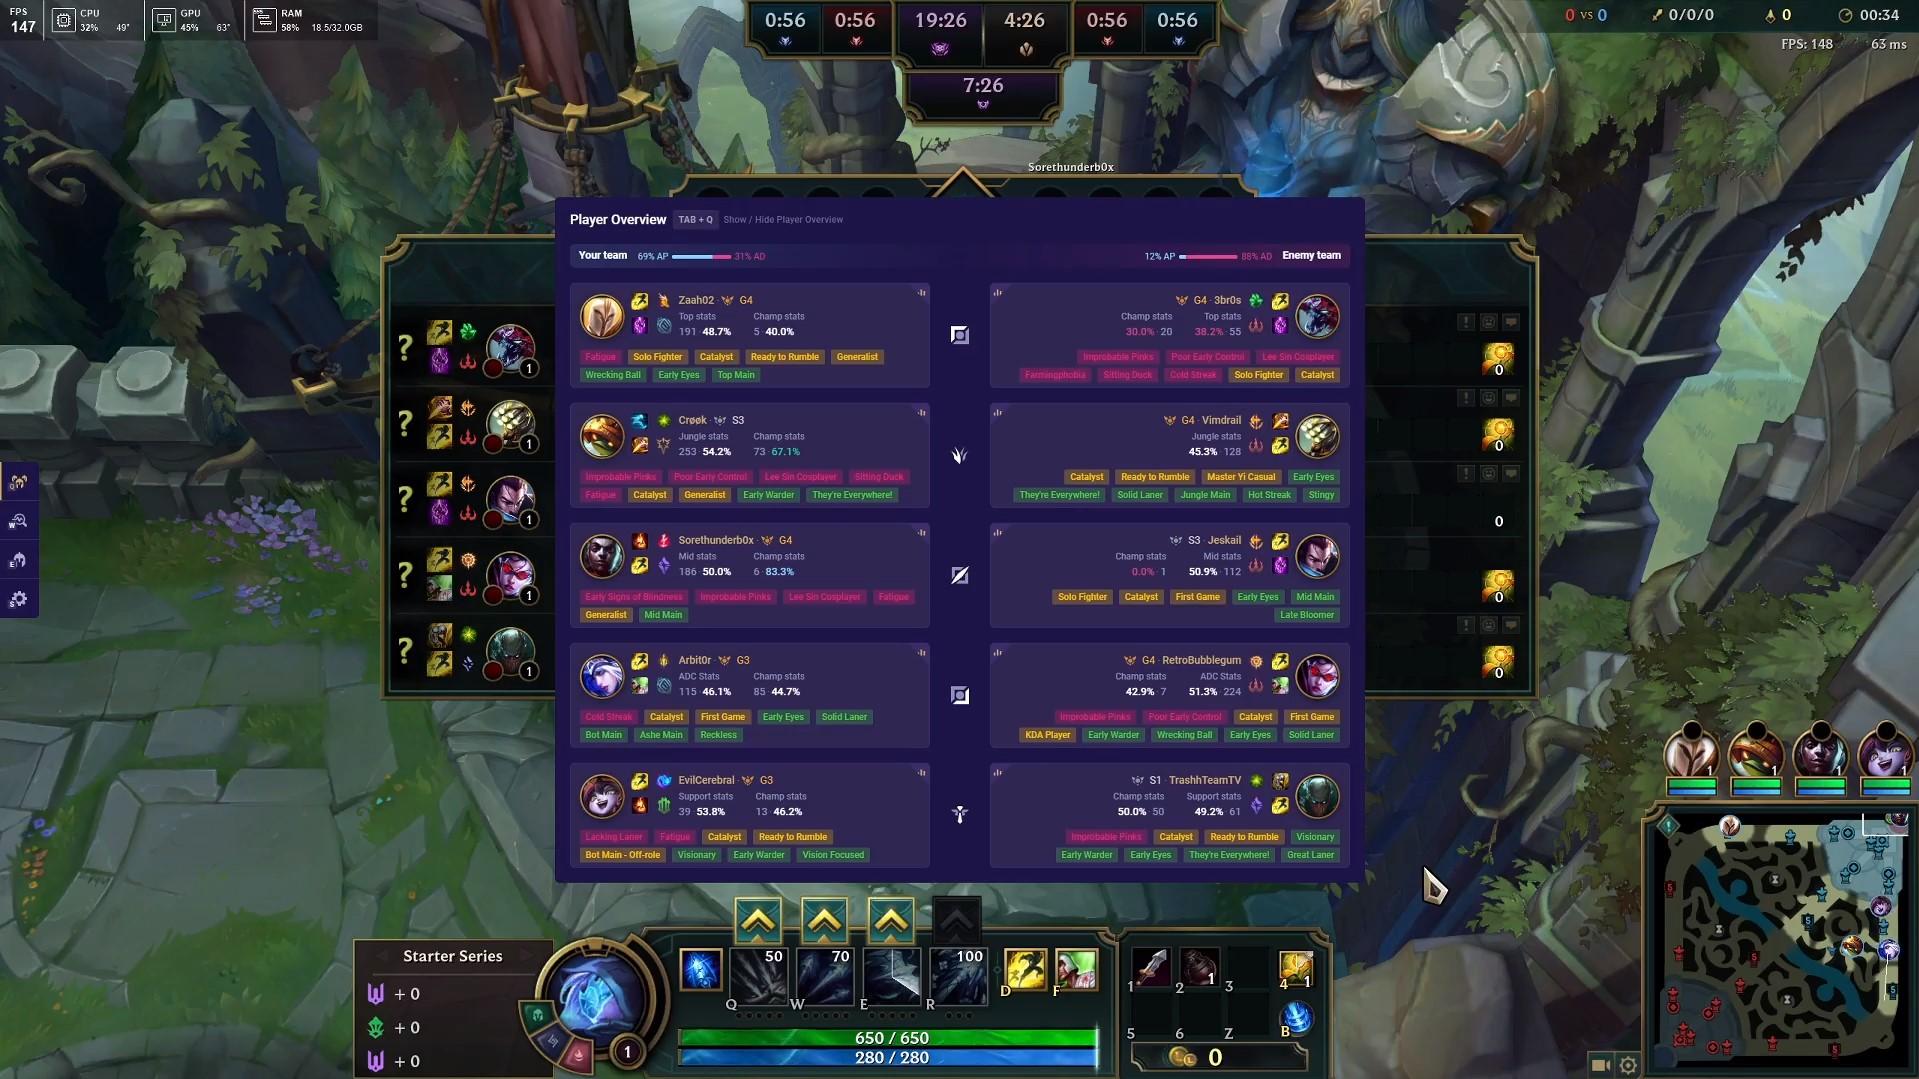 LoL Overlay Tab + Q Ashe Game